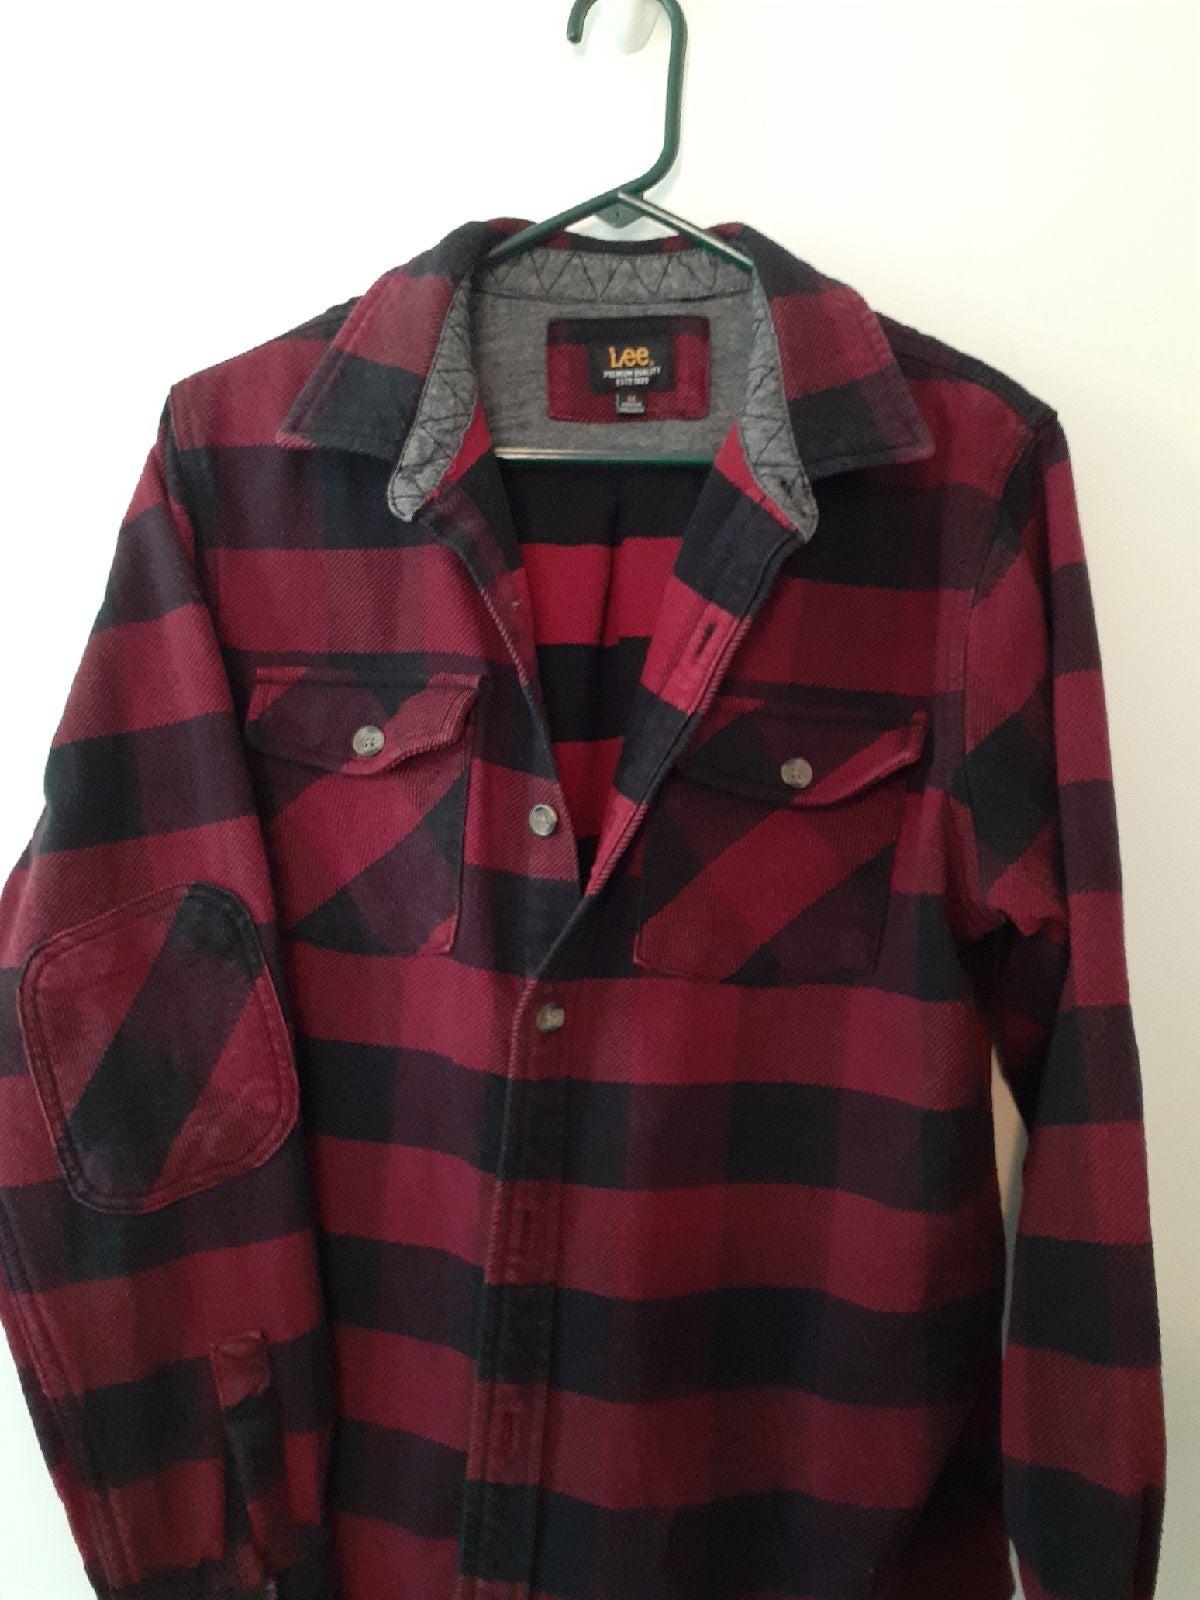 Heavy Duty Lee Plaid Shirt,Jacket